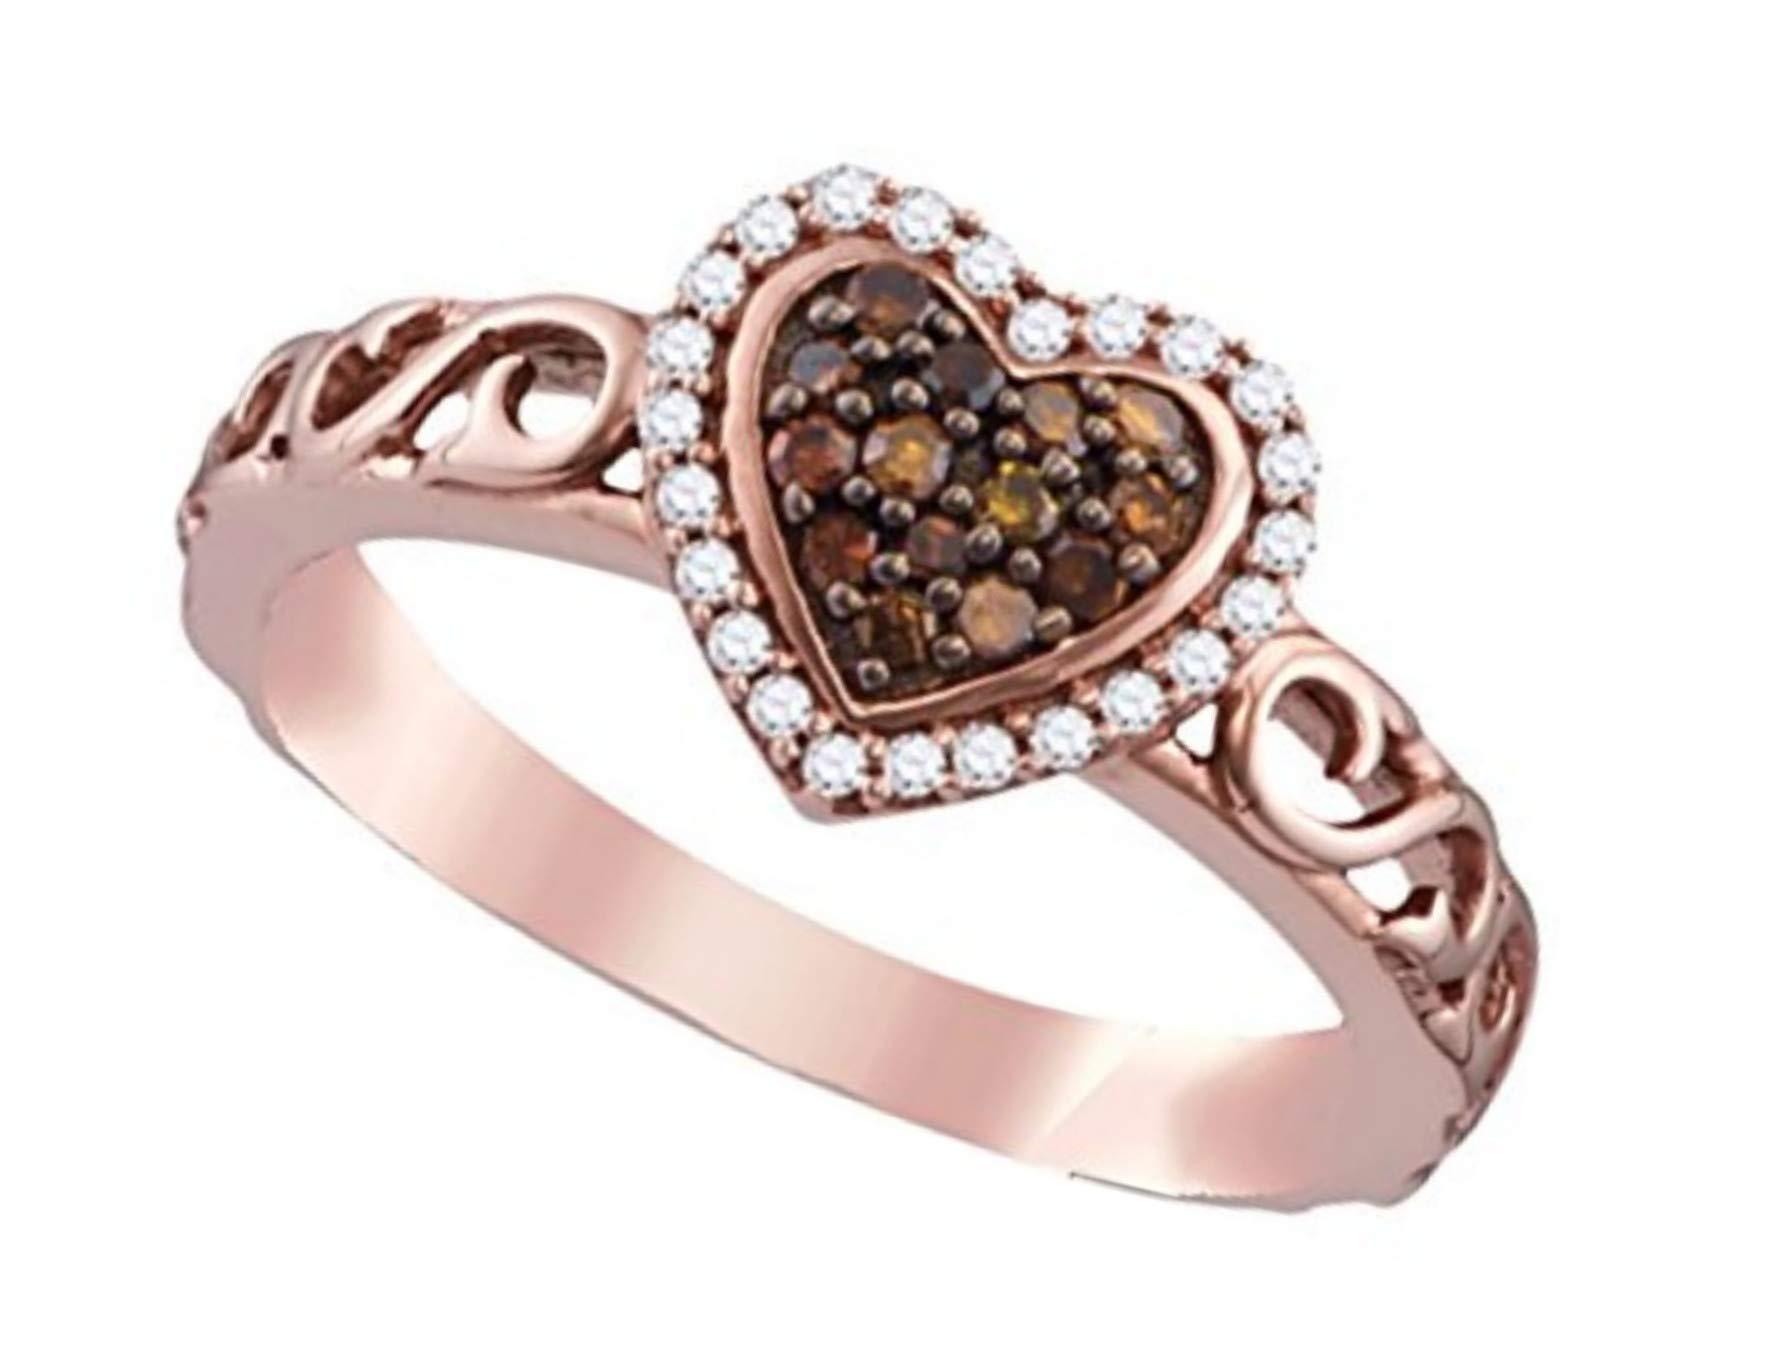 Brandy Diamond Chocolate Brown 10k Rose Gold Halo Heart Fine Design Ring 1/4 Ctw. (8) by Brandy Diamond